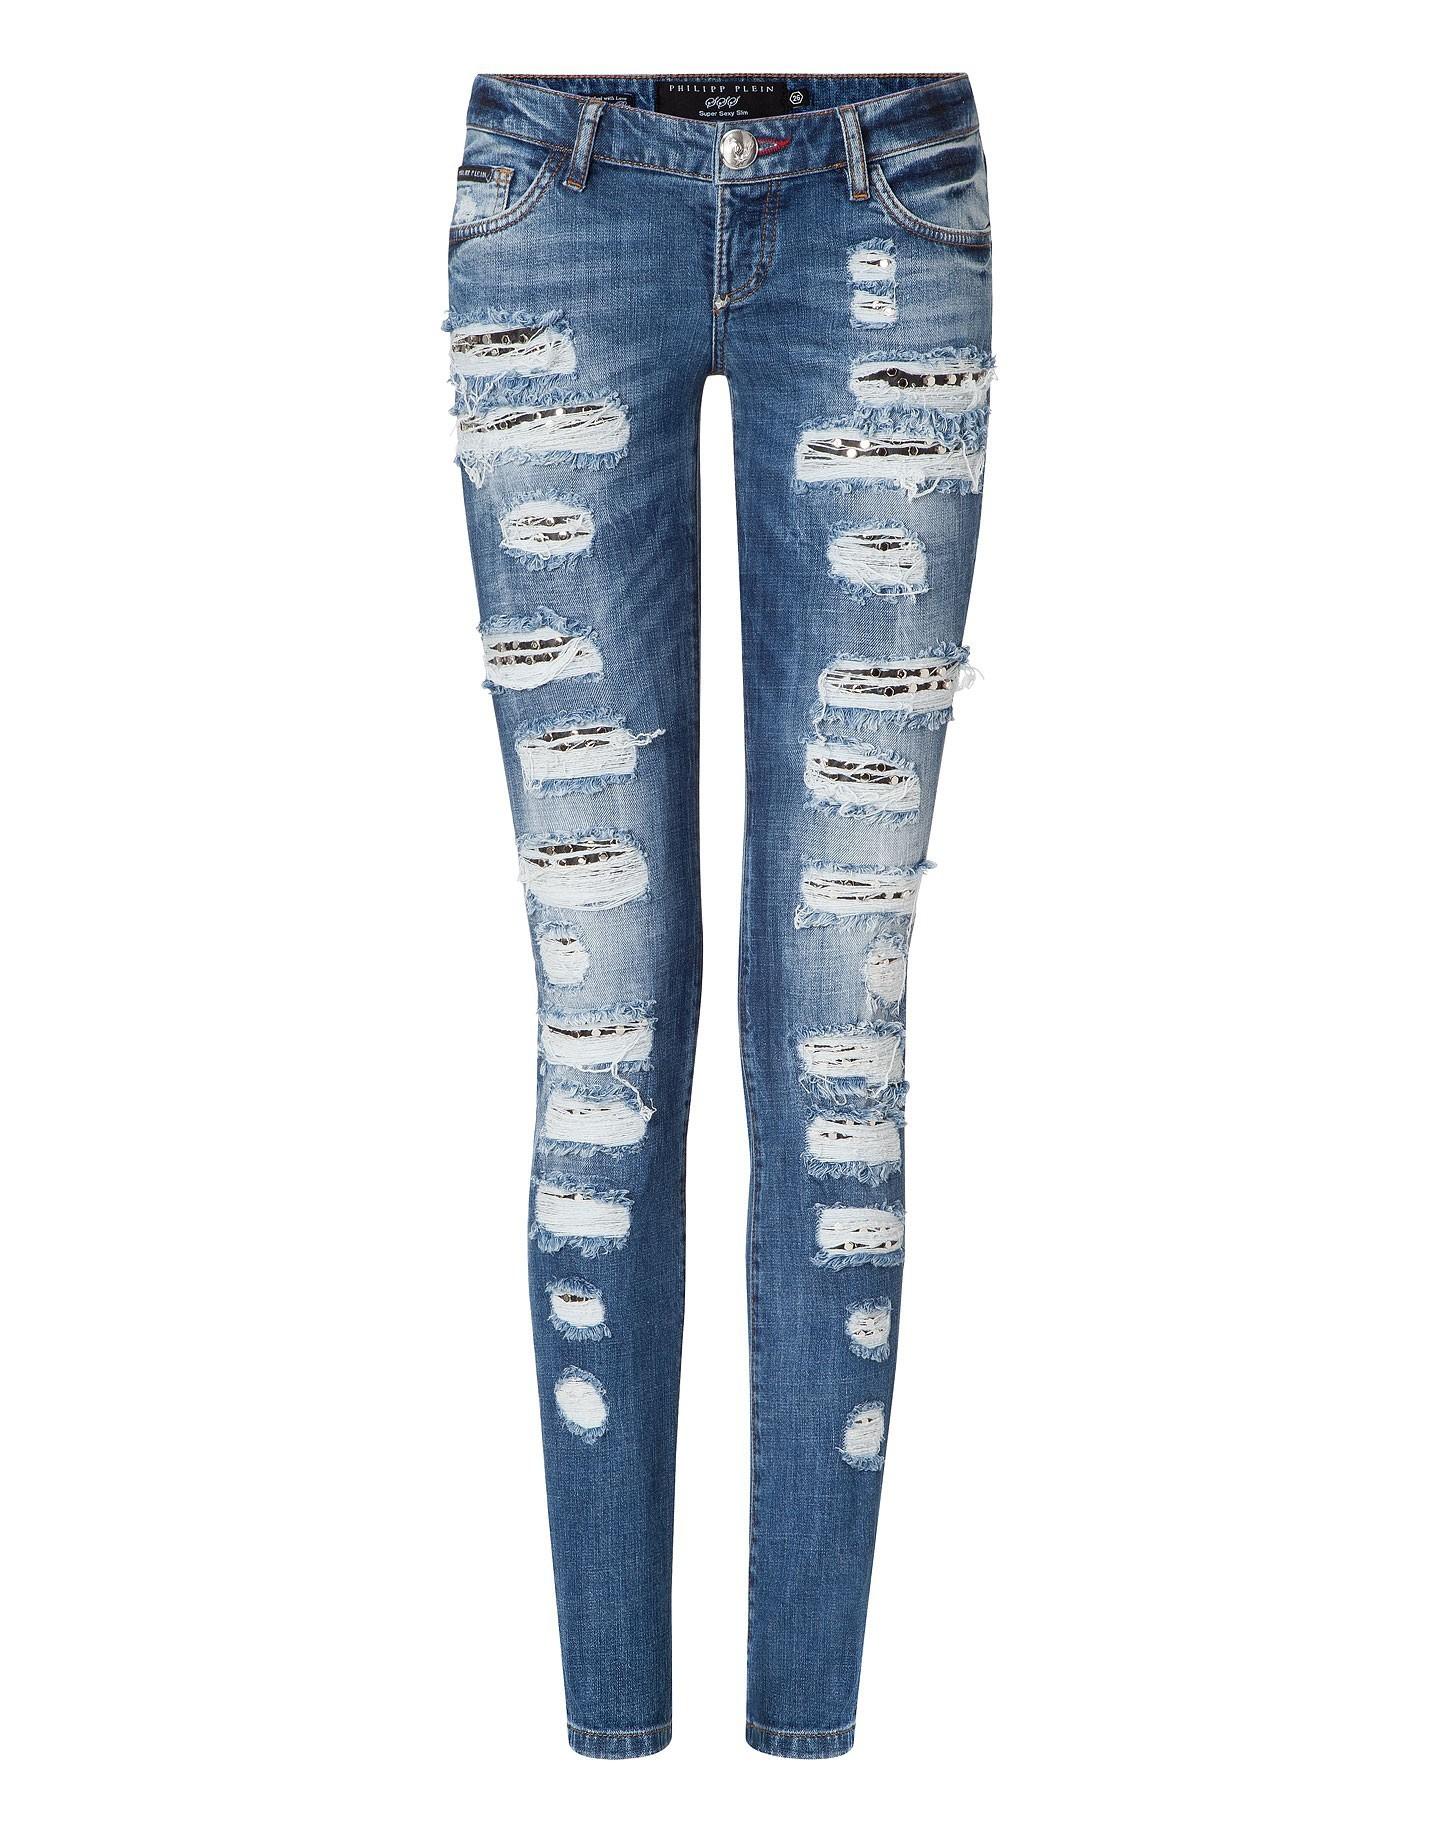 "Philipp plein jeans ""debated"" cw 500644"